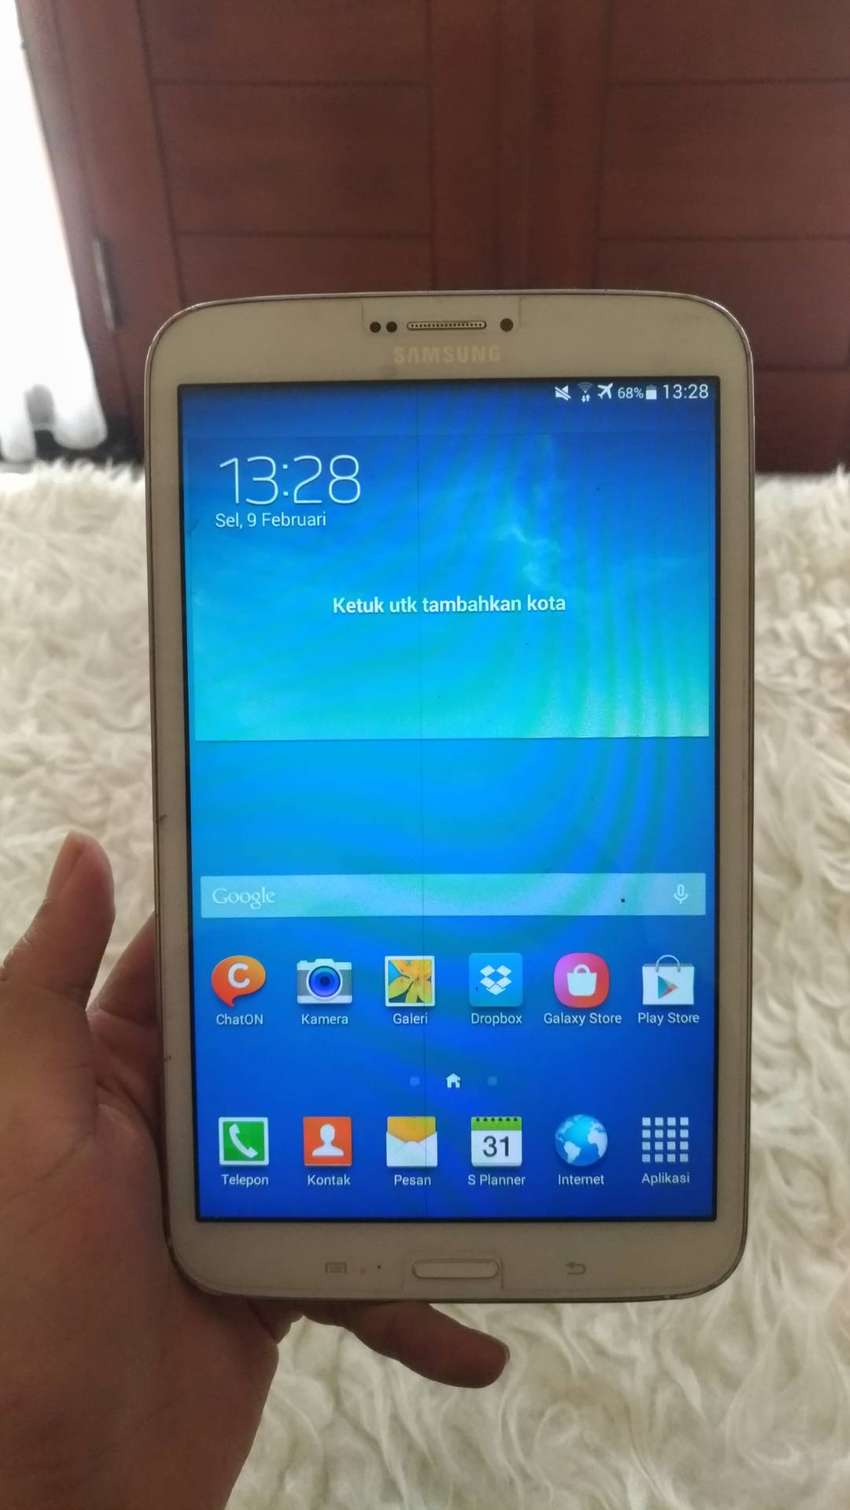 Samsung Galaxy Tab 3 SM-T311 Batangan